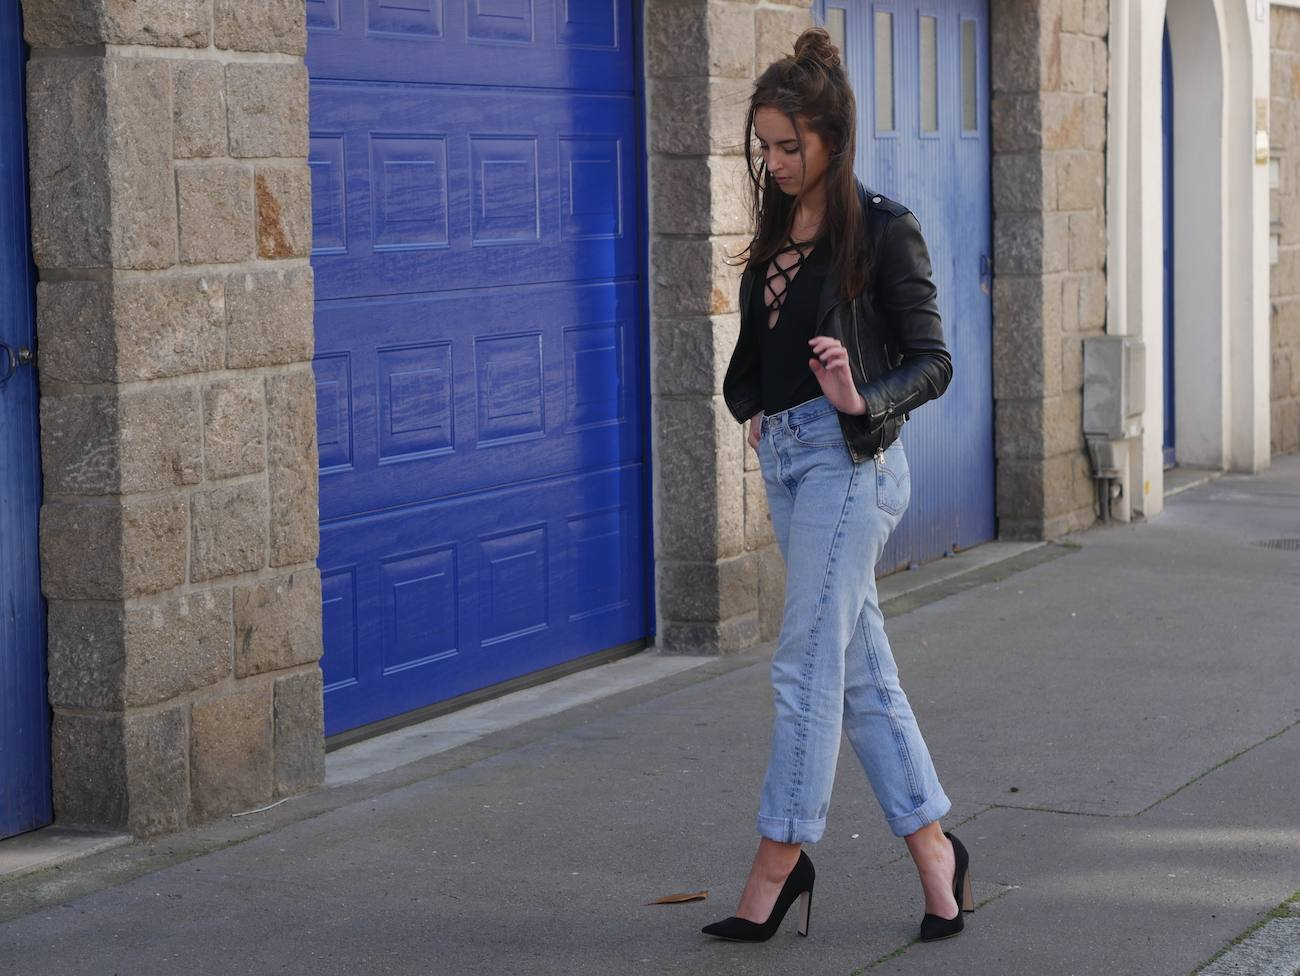 blog nantes - nolwenn c 7